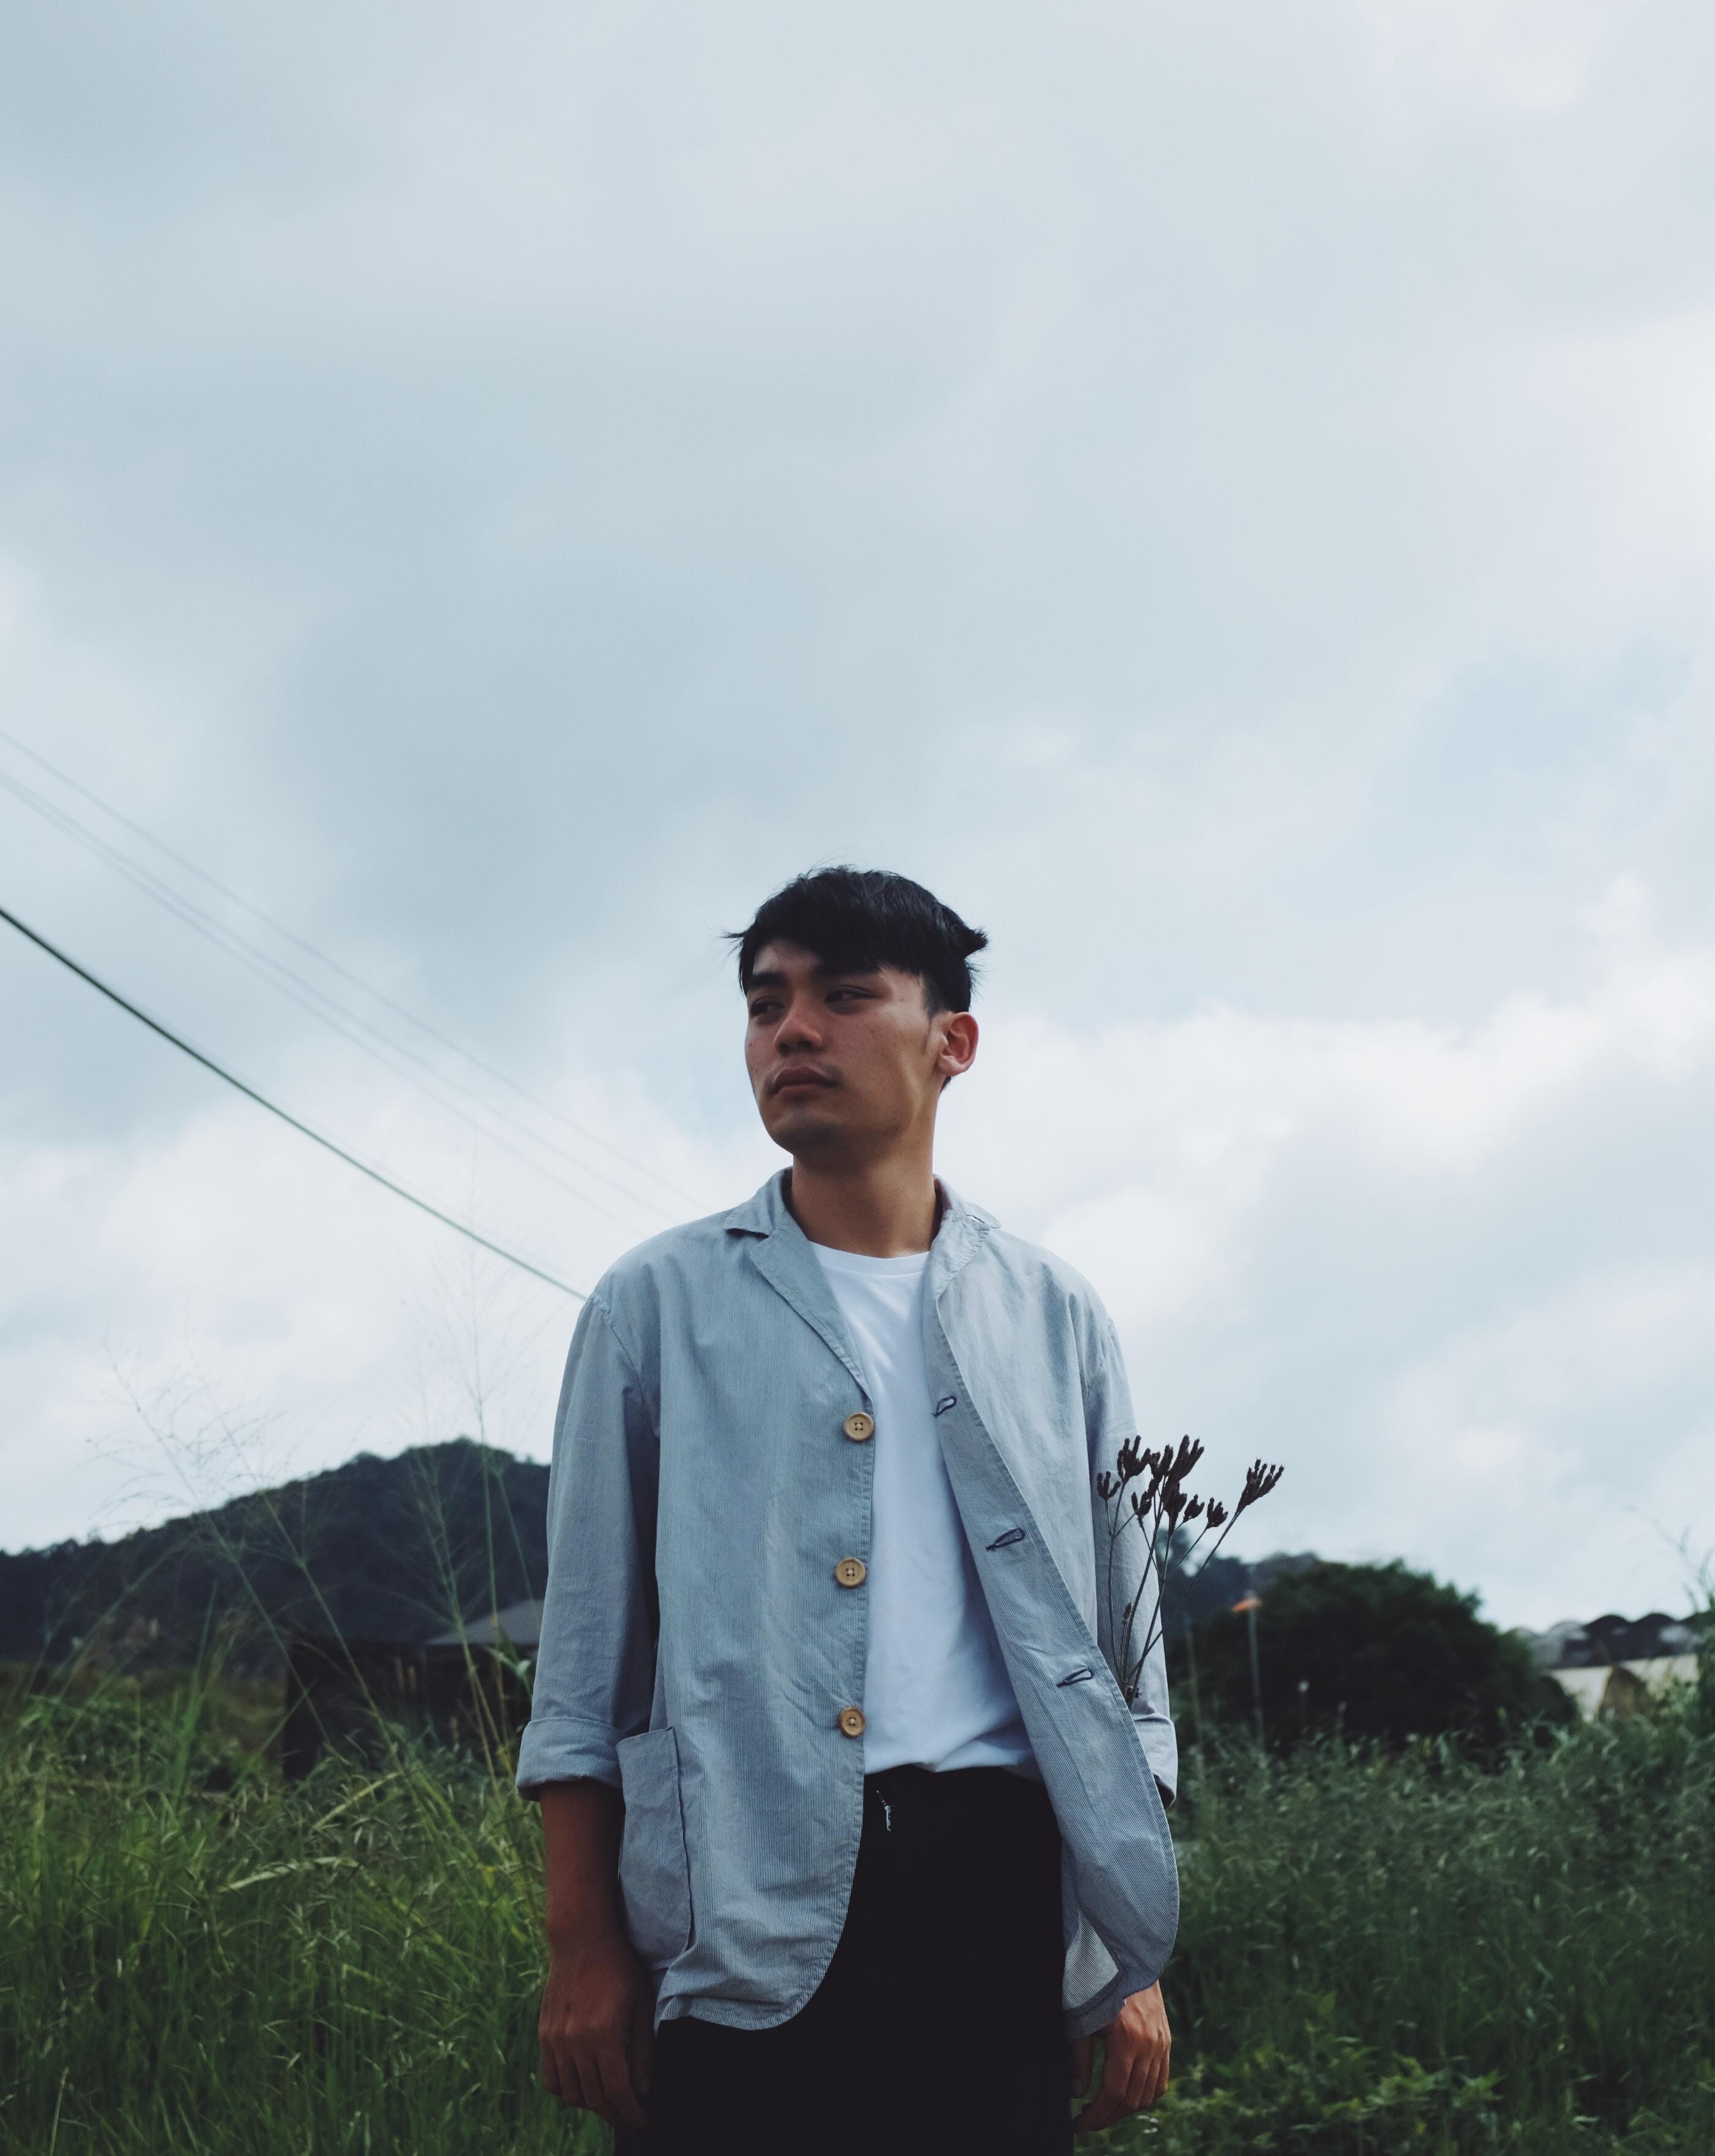 Go to Isaac Li Shung Tan's profile